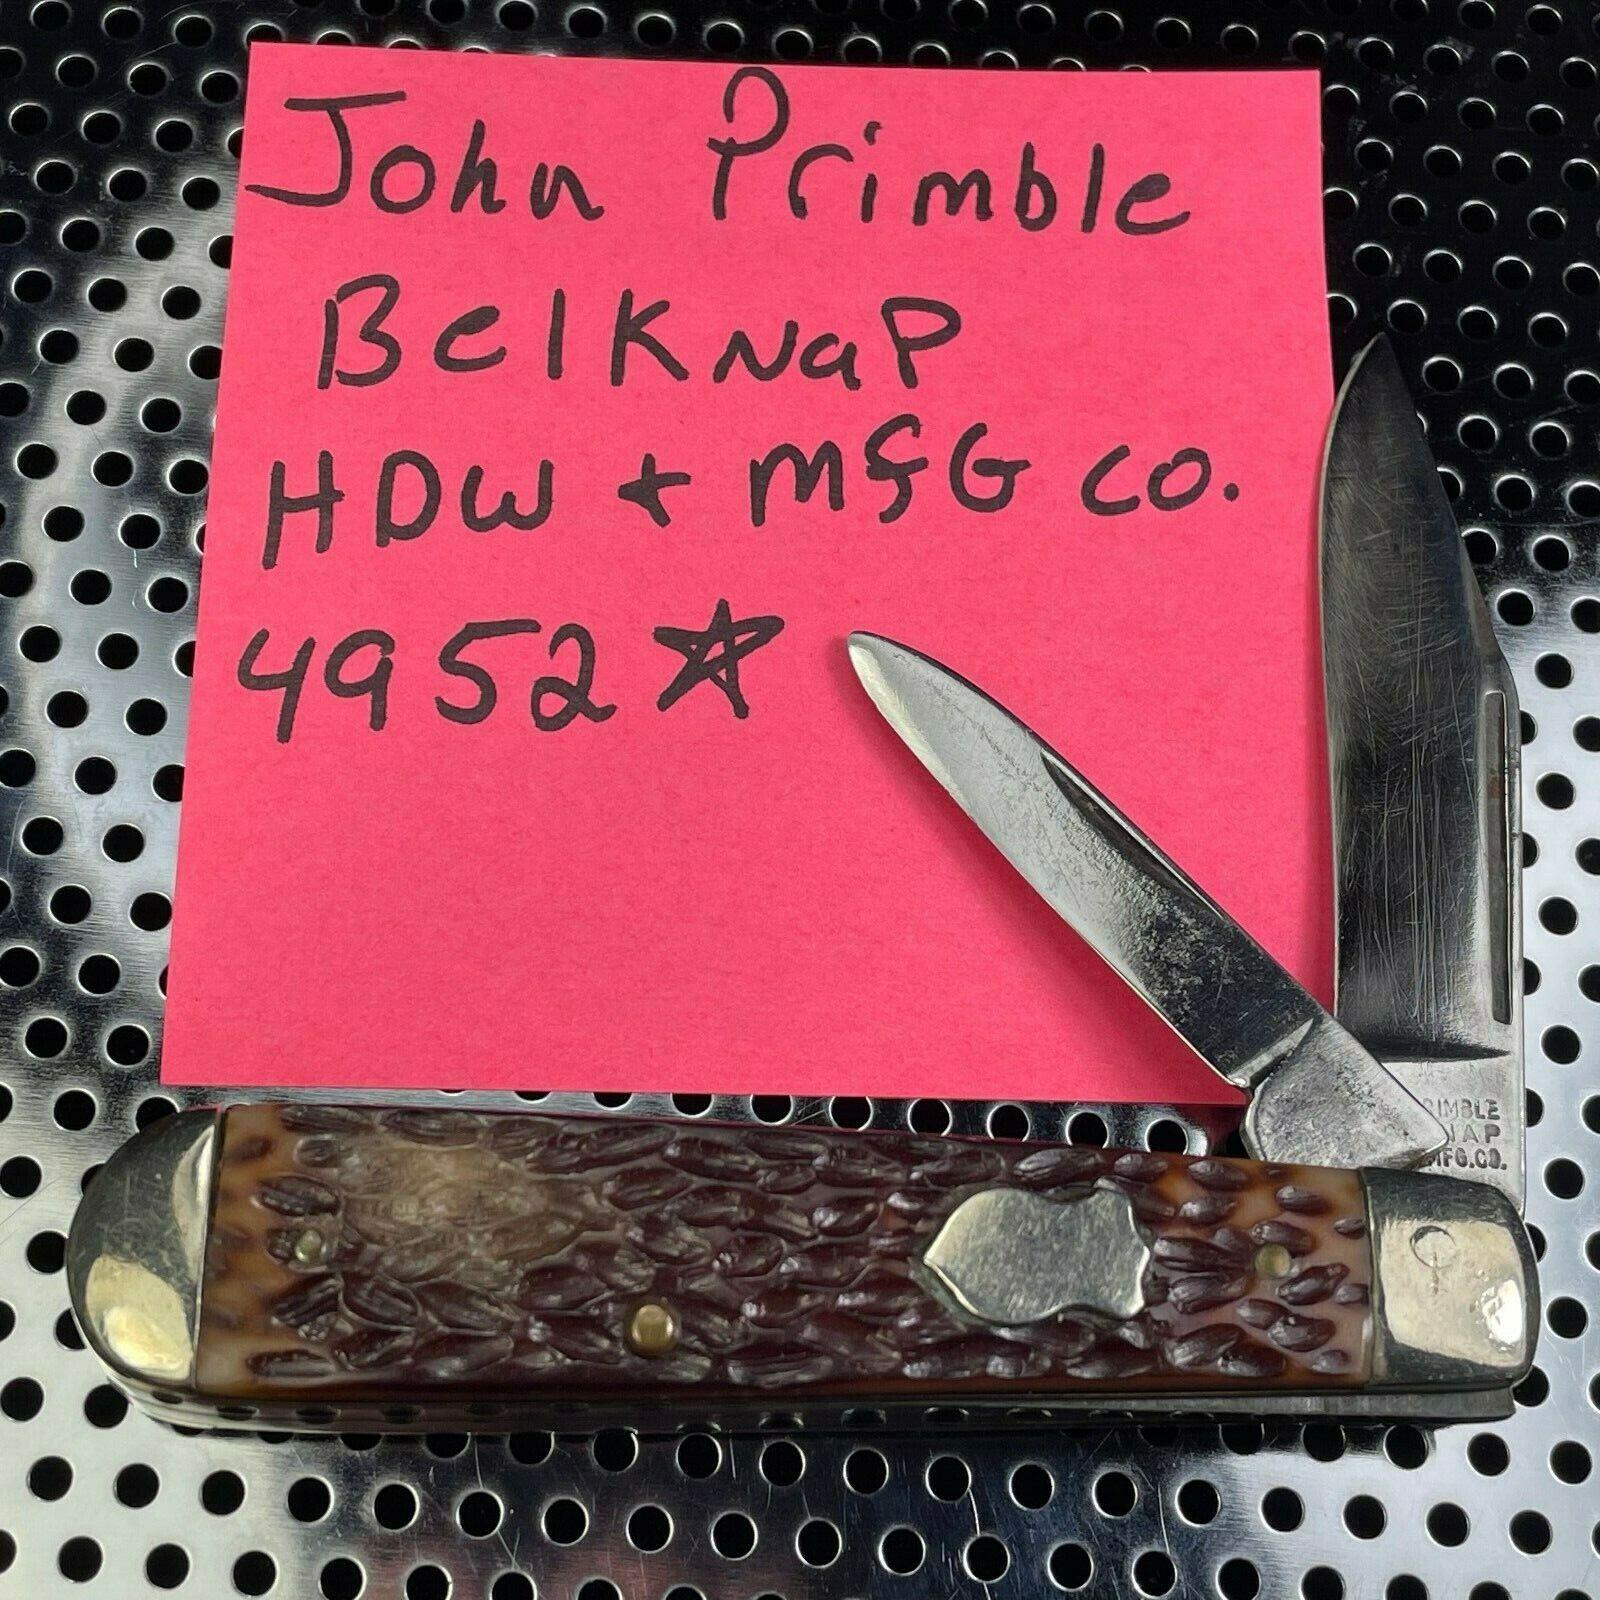 VINTAGE JOHN PRIMBLE BELKNAP HDW & MFG CO. #4952 2 BLADE POCKET KNIFE